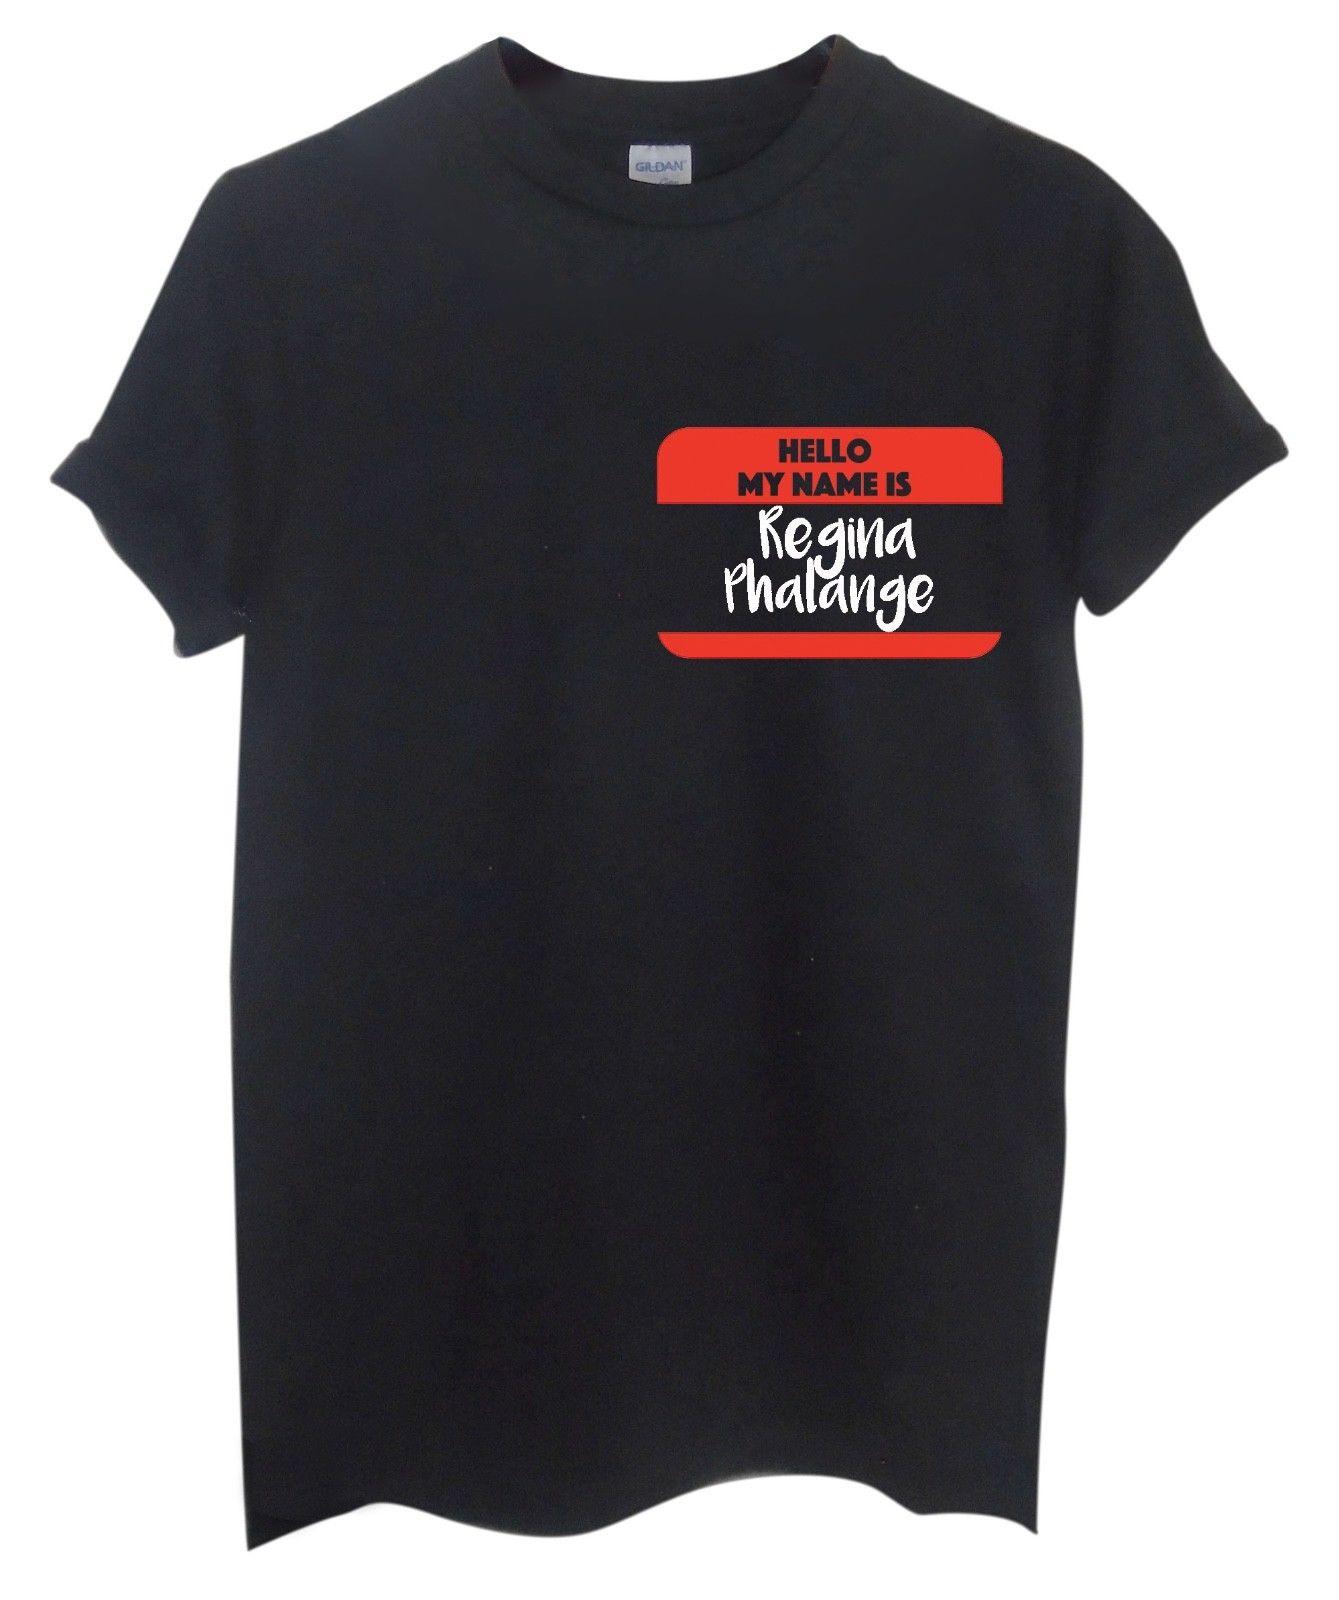 Regina Phalange T Unisex camiseta   Top   Camiseta   Amigos   Phoebe   Regalo Casual orgullo t camisa de los hombres Unisex nuevo